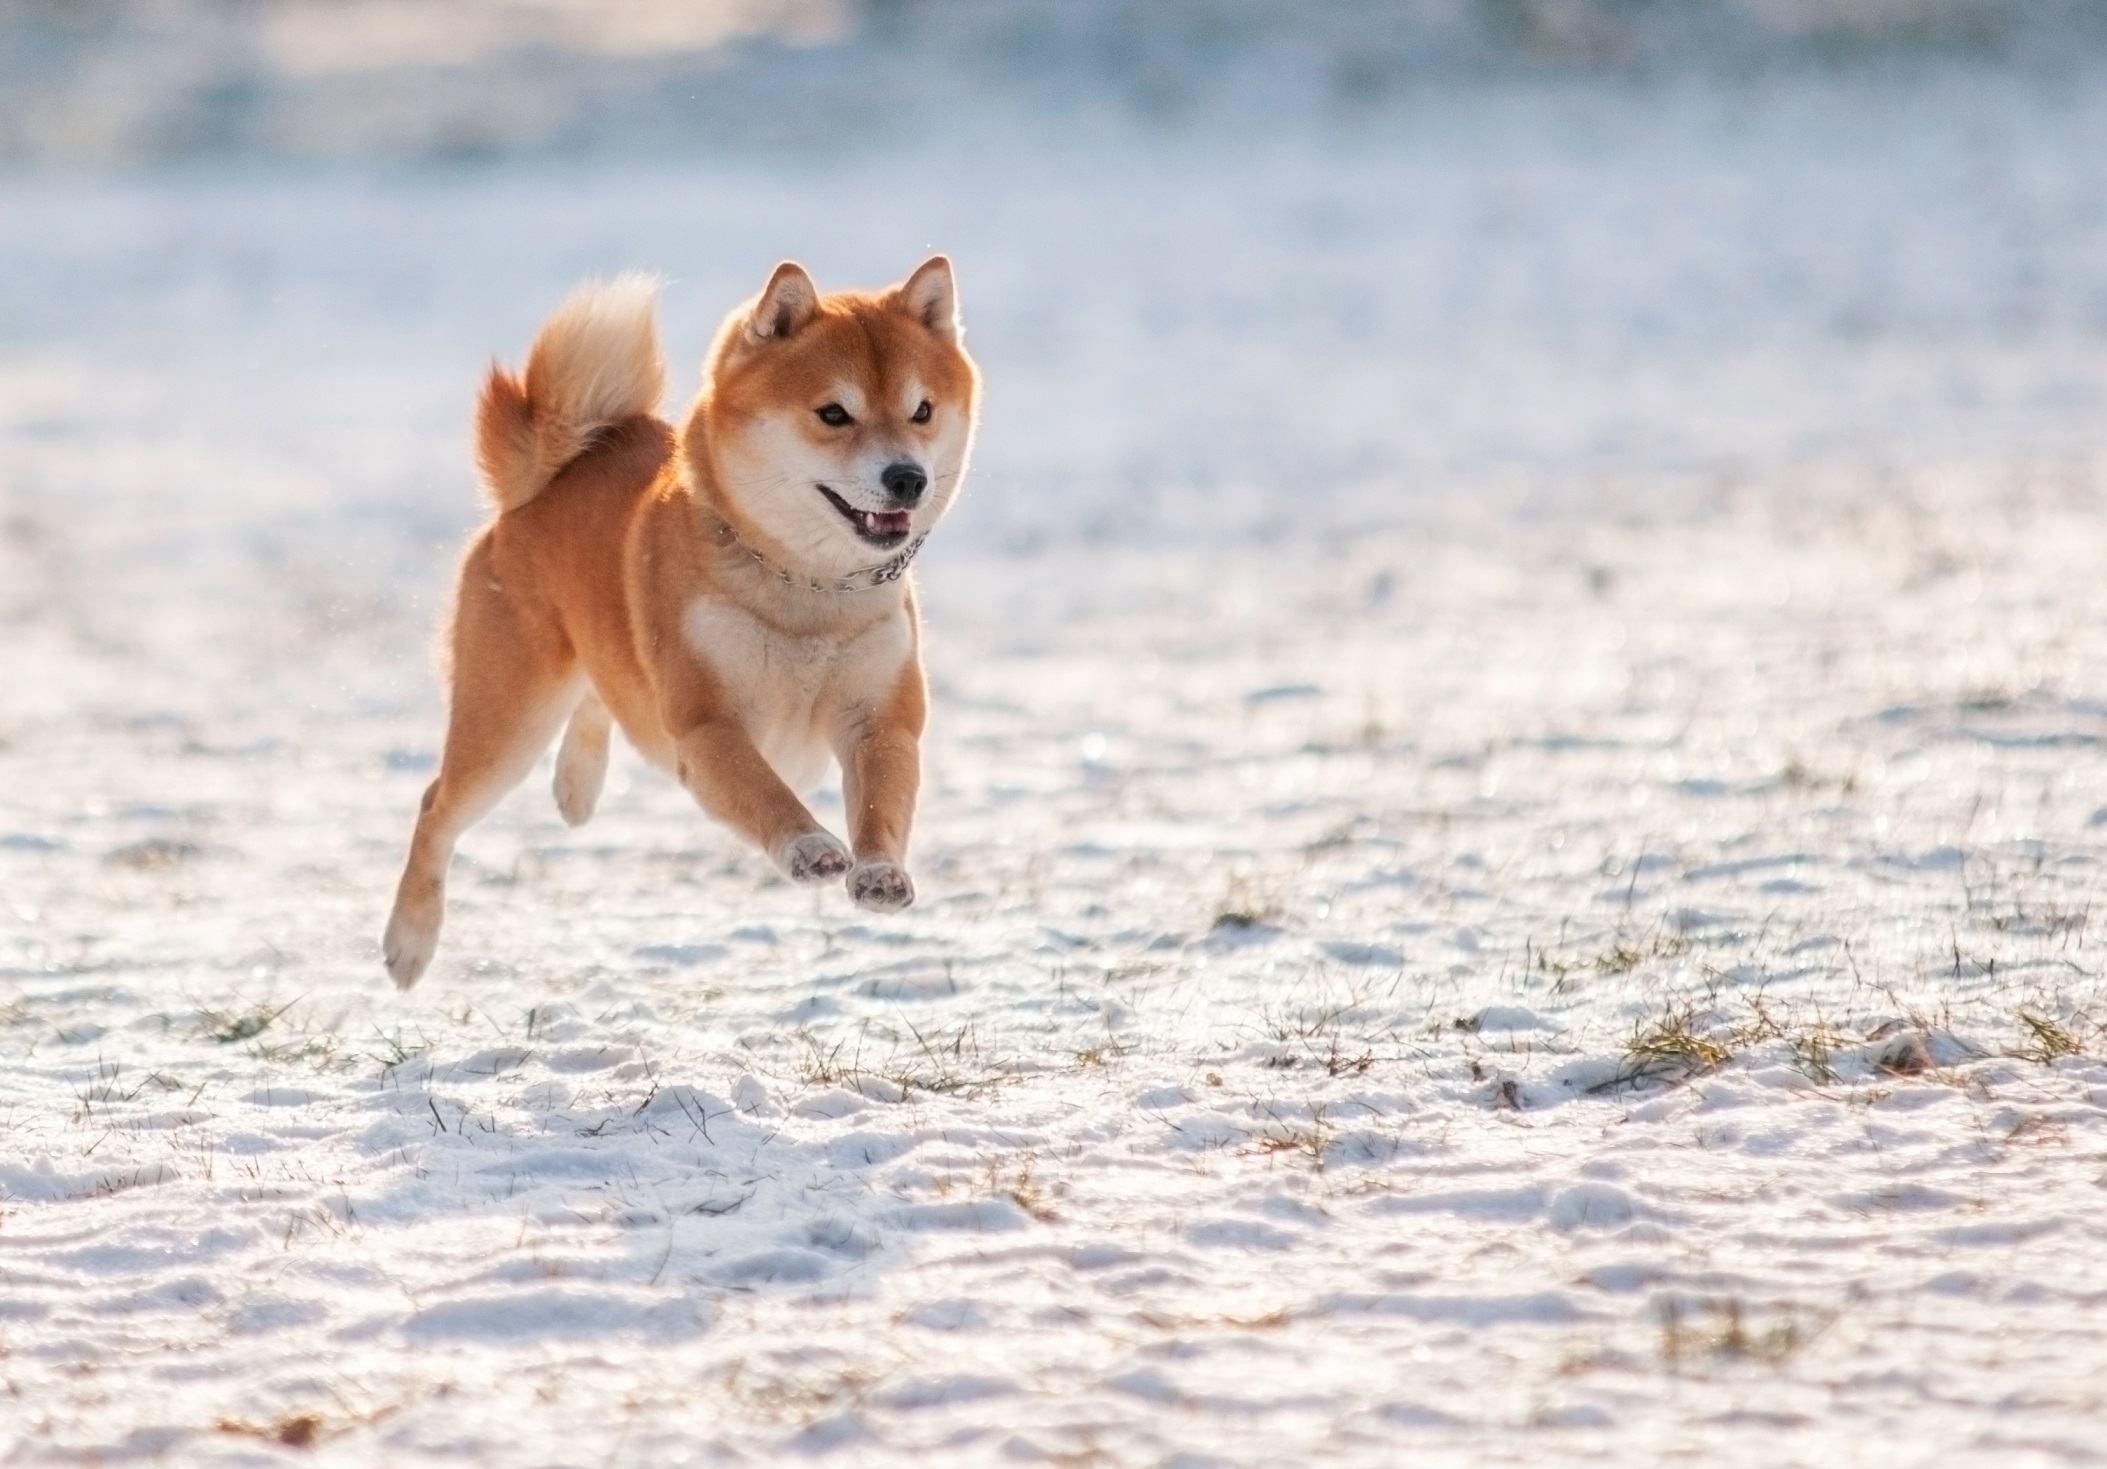 Shibu inu jumping in the snow